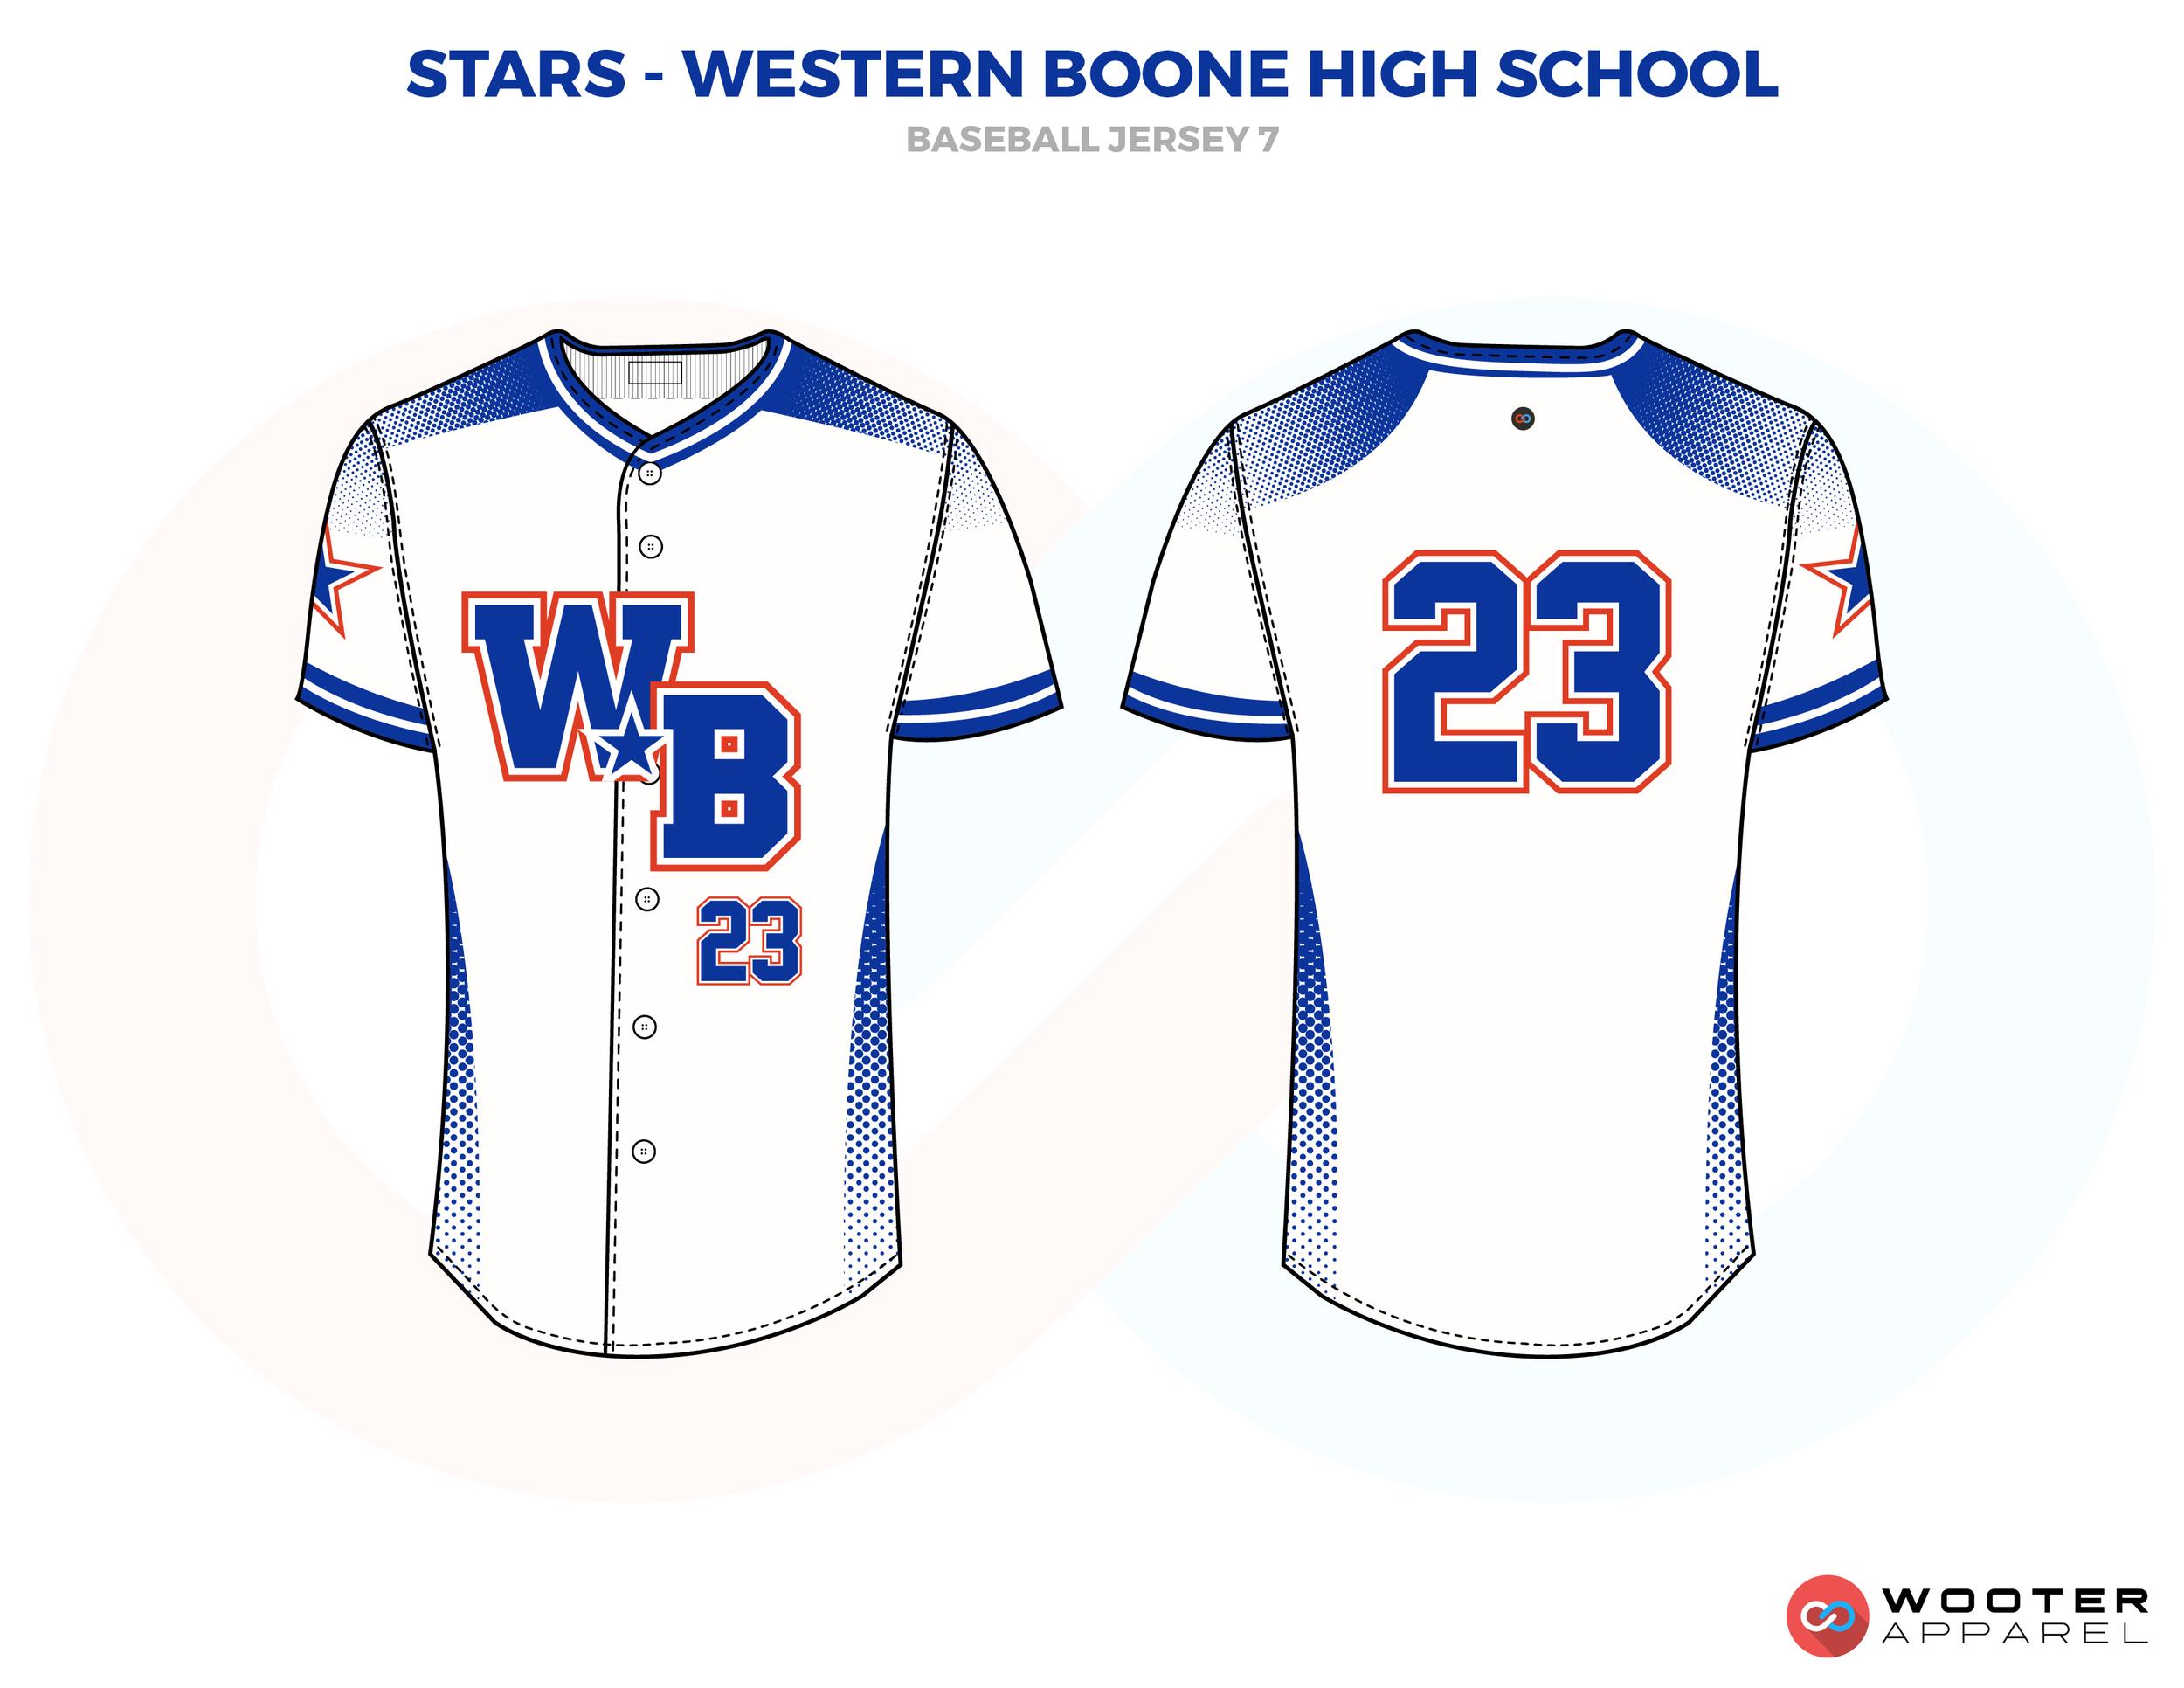 STARS- WESTERN BOONE HIGH SCHOOL white blue red School baseball uniforms jerseys tops